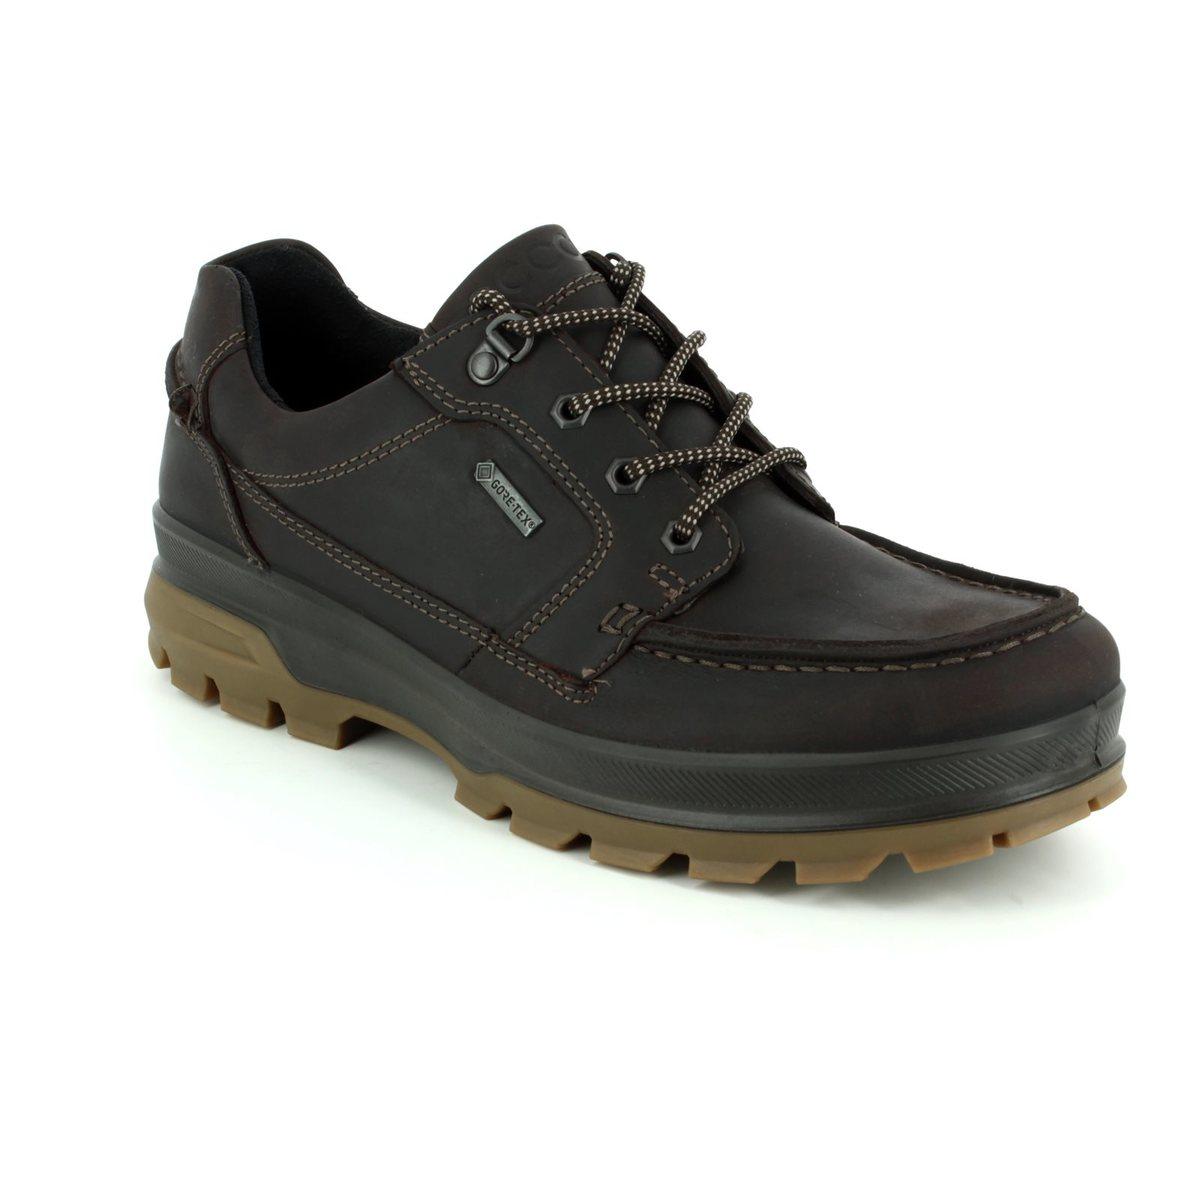 ECCO Casual Shoes - Brown nubuck - 838004 02178 RUGGED TRACK 1944 GORE-TEX f21440cc81b